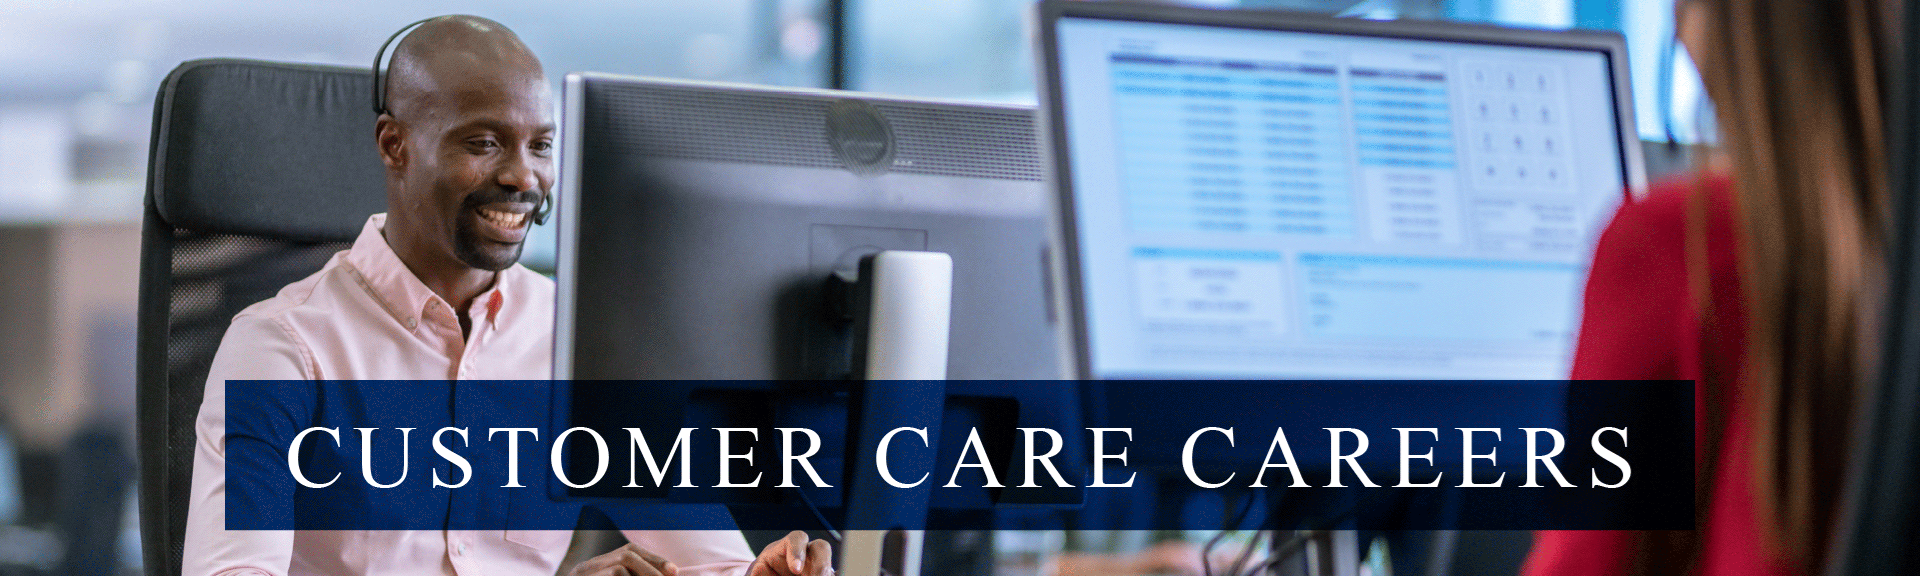 Customer Care Careers Desktop